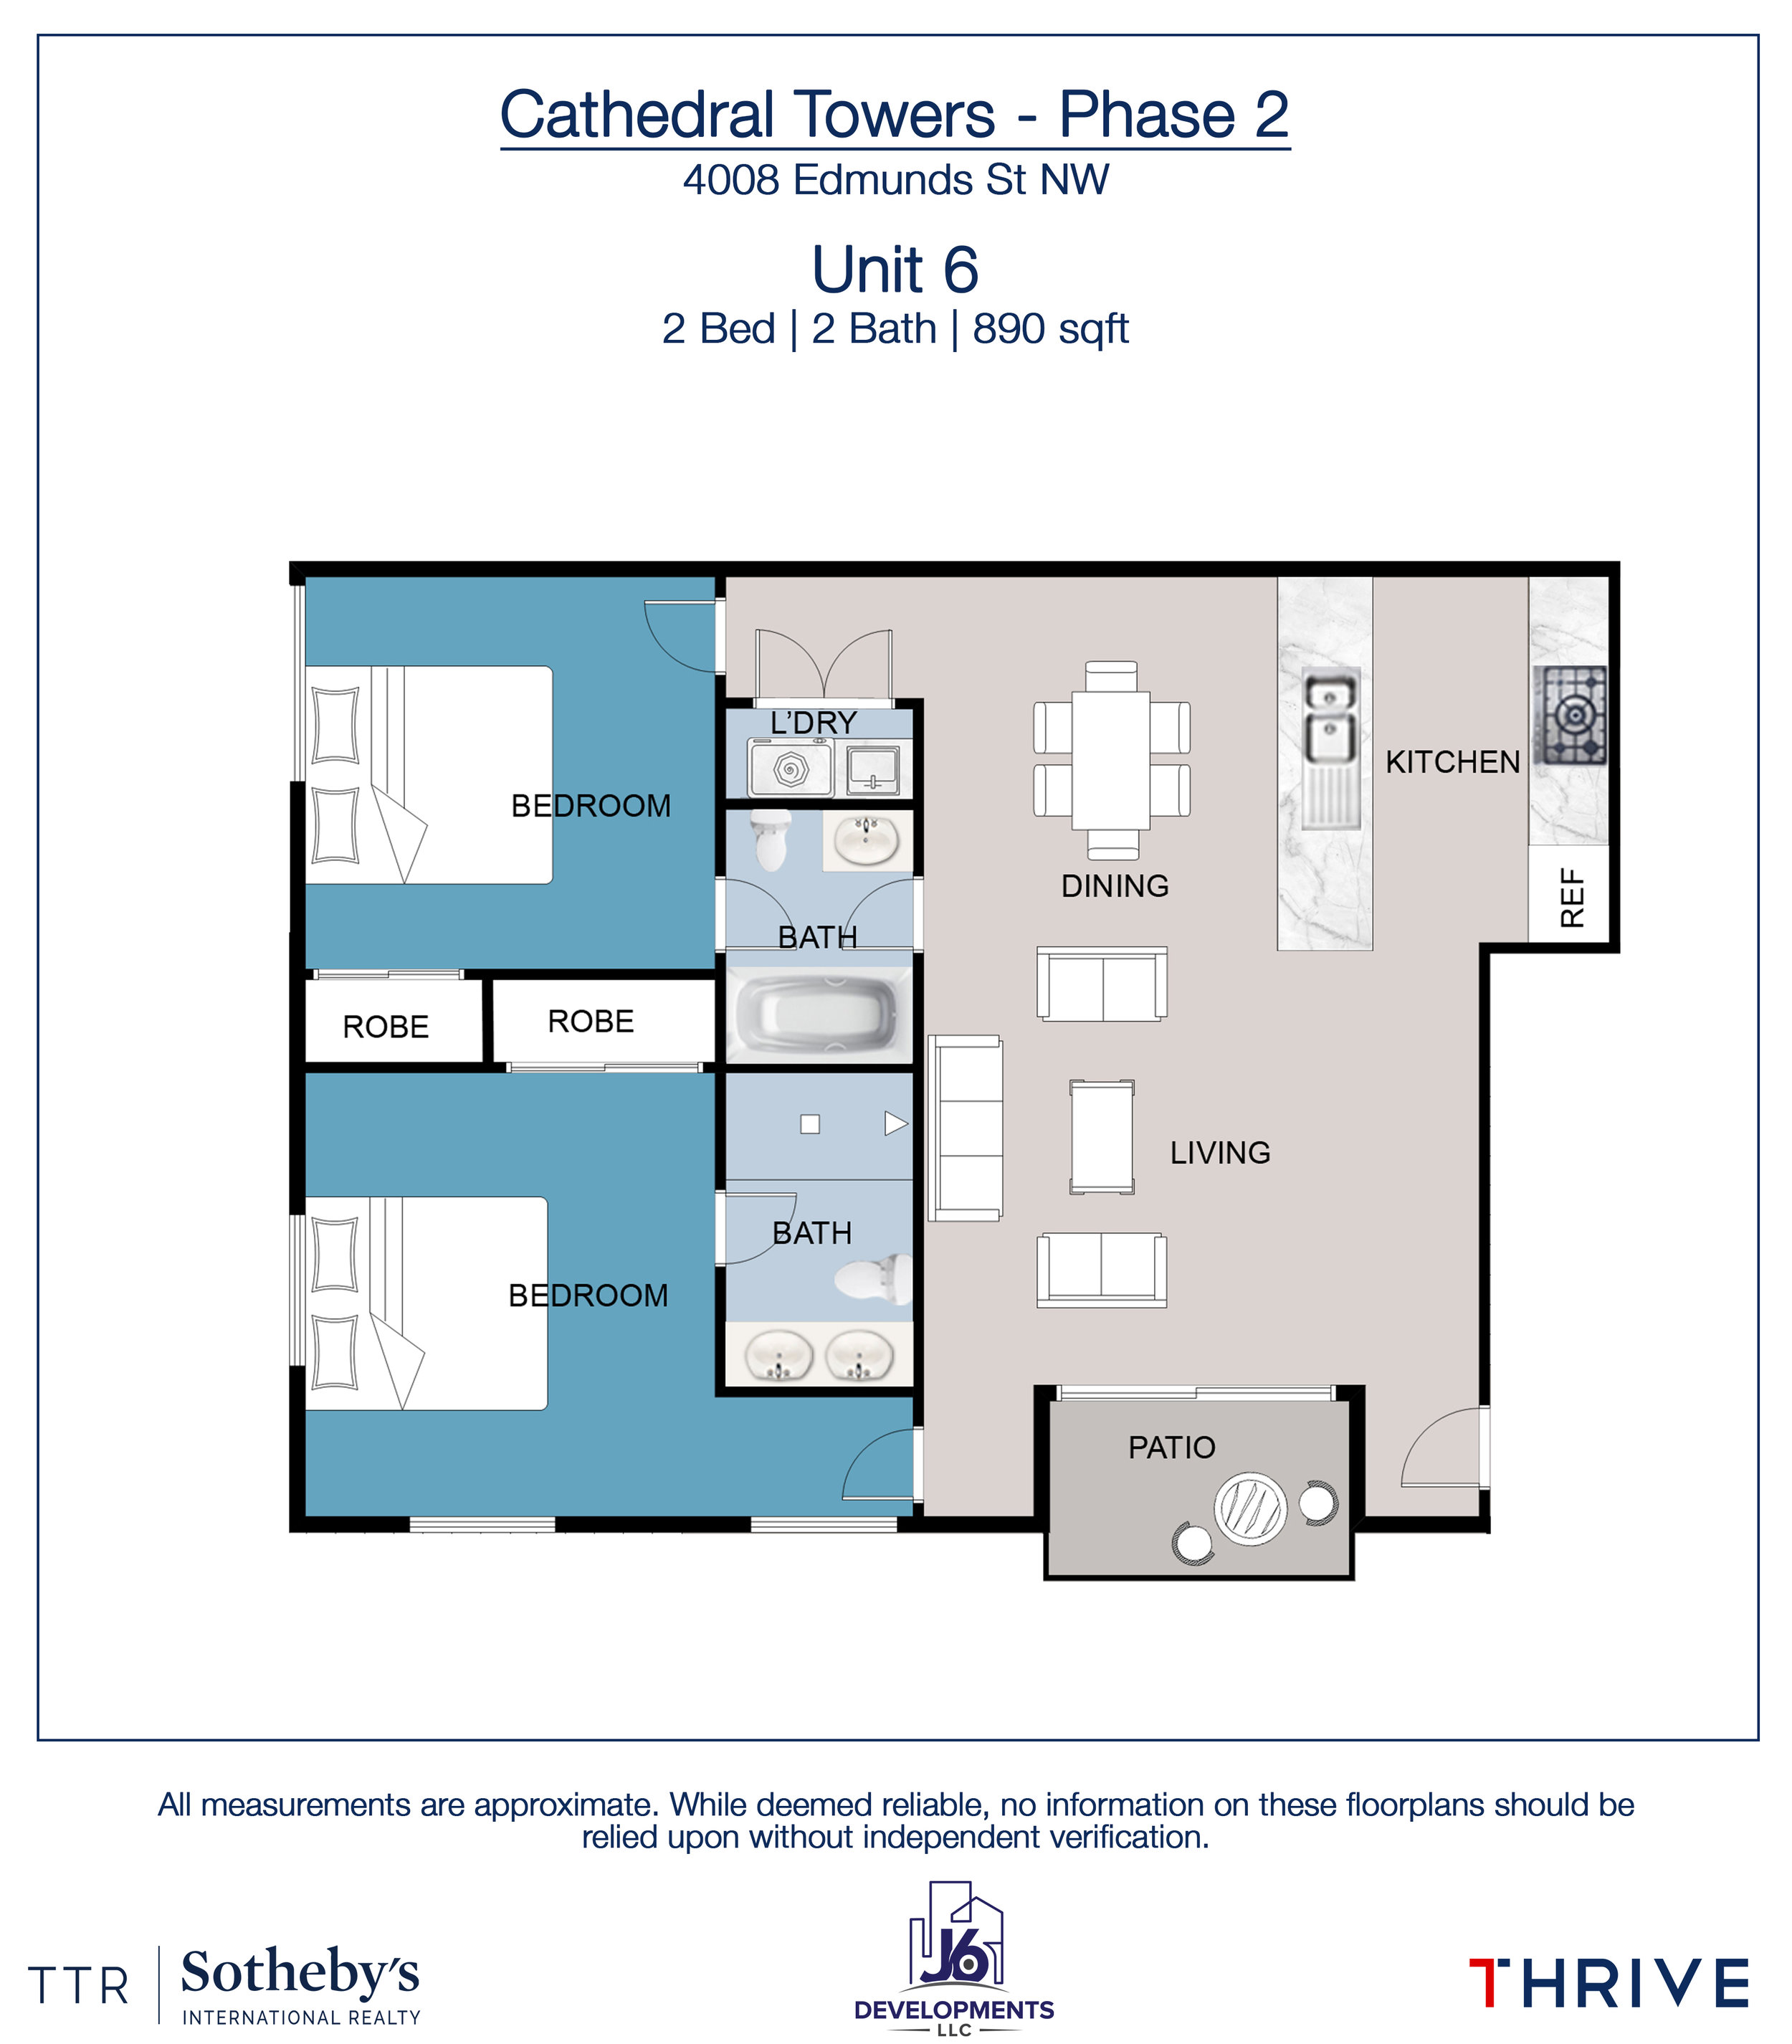 4008 Edmunds Unit 6 - Floorplan - 7.31.18.jpg